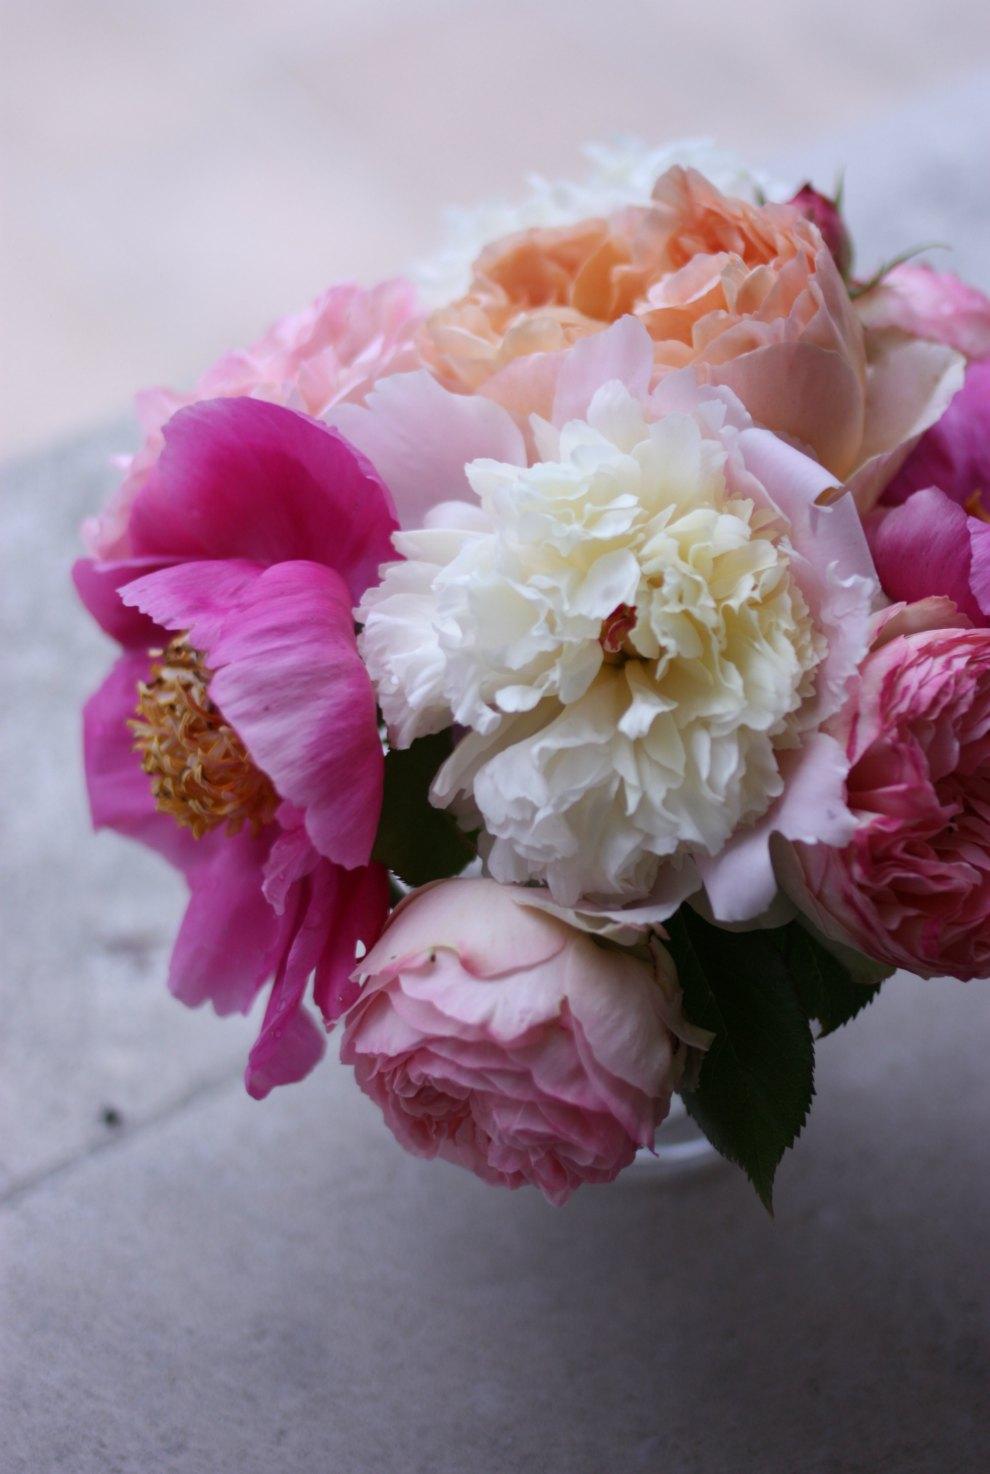 peonies-and-roses-by-madame-love.jpg